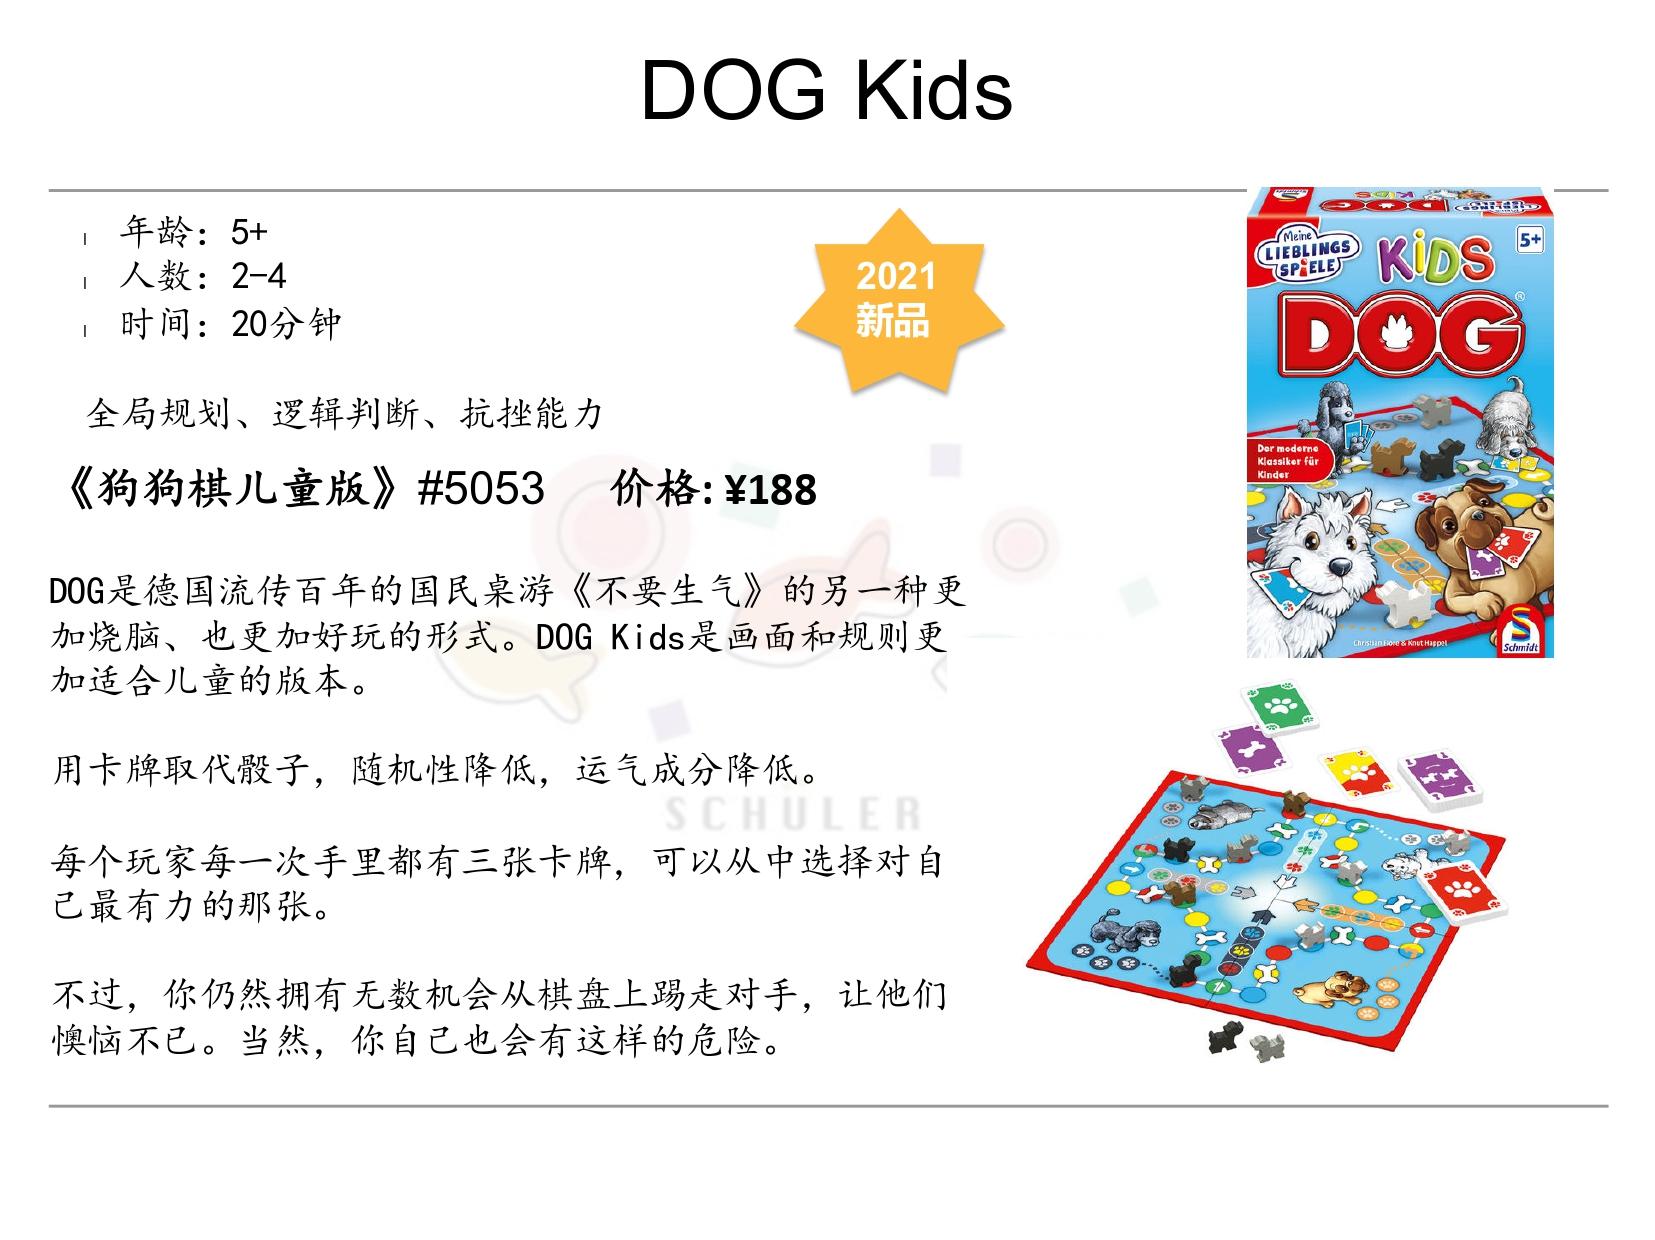 DOG Kids 狗狗棋儿童版